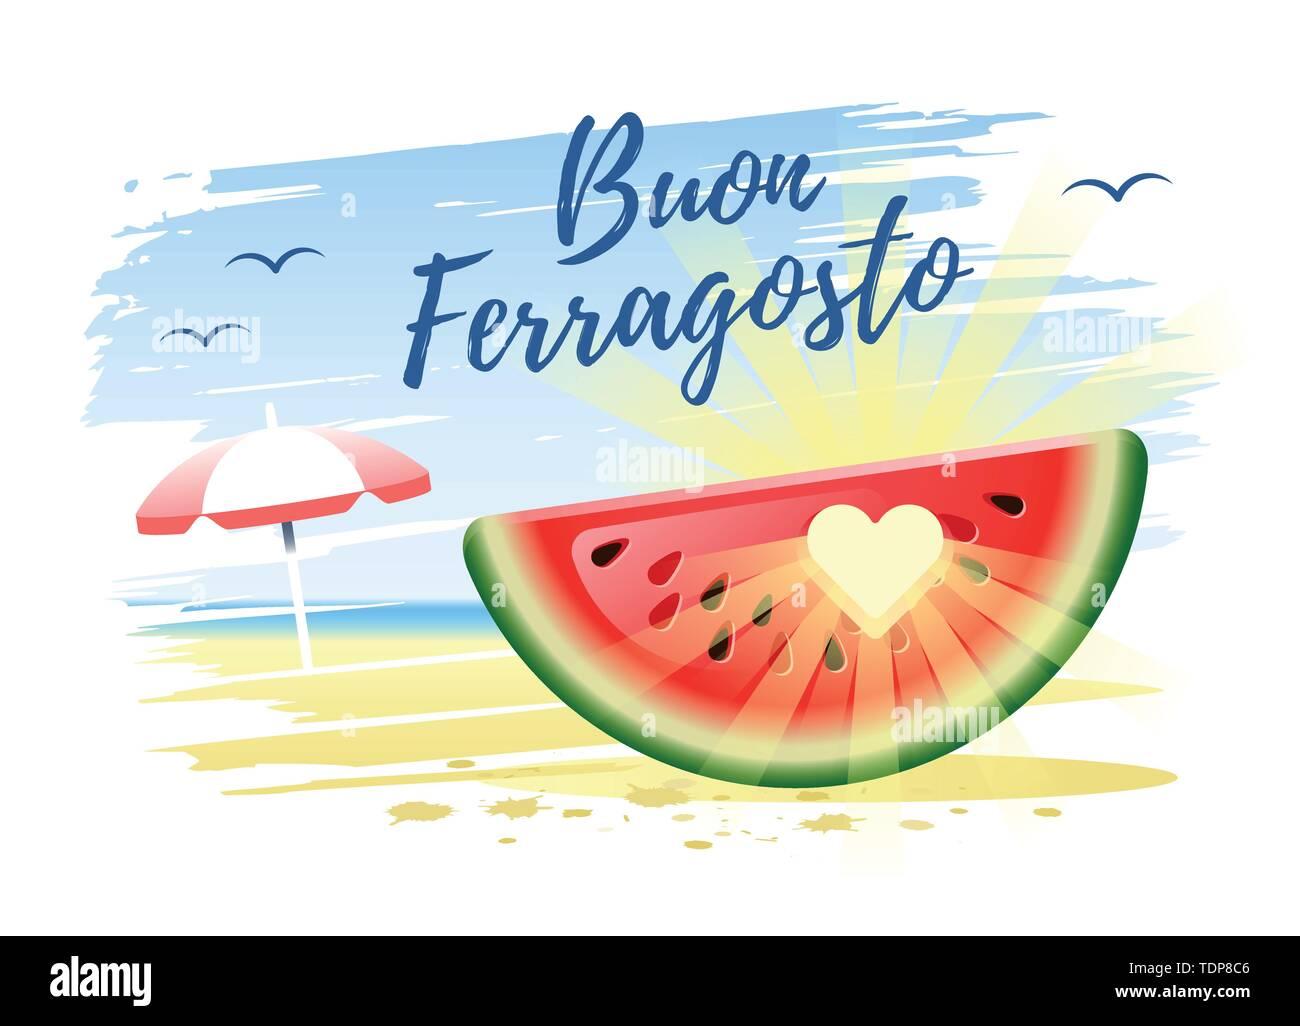 Buon Ferragosto. Happy Summer Holidays in Italian. Italian summer holidays concept with watermelon, sun and beach umbrella on the sand beach backgroun - Stock Image